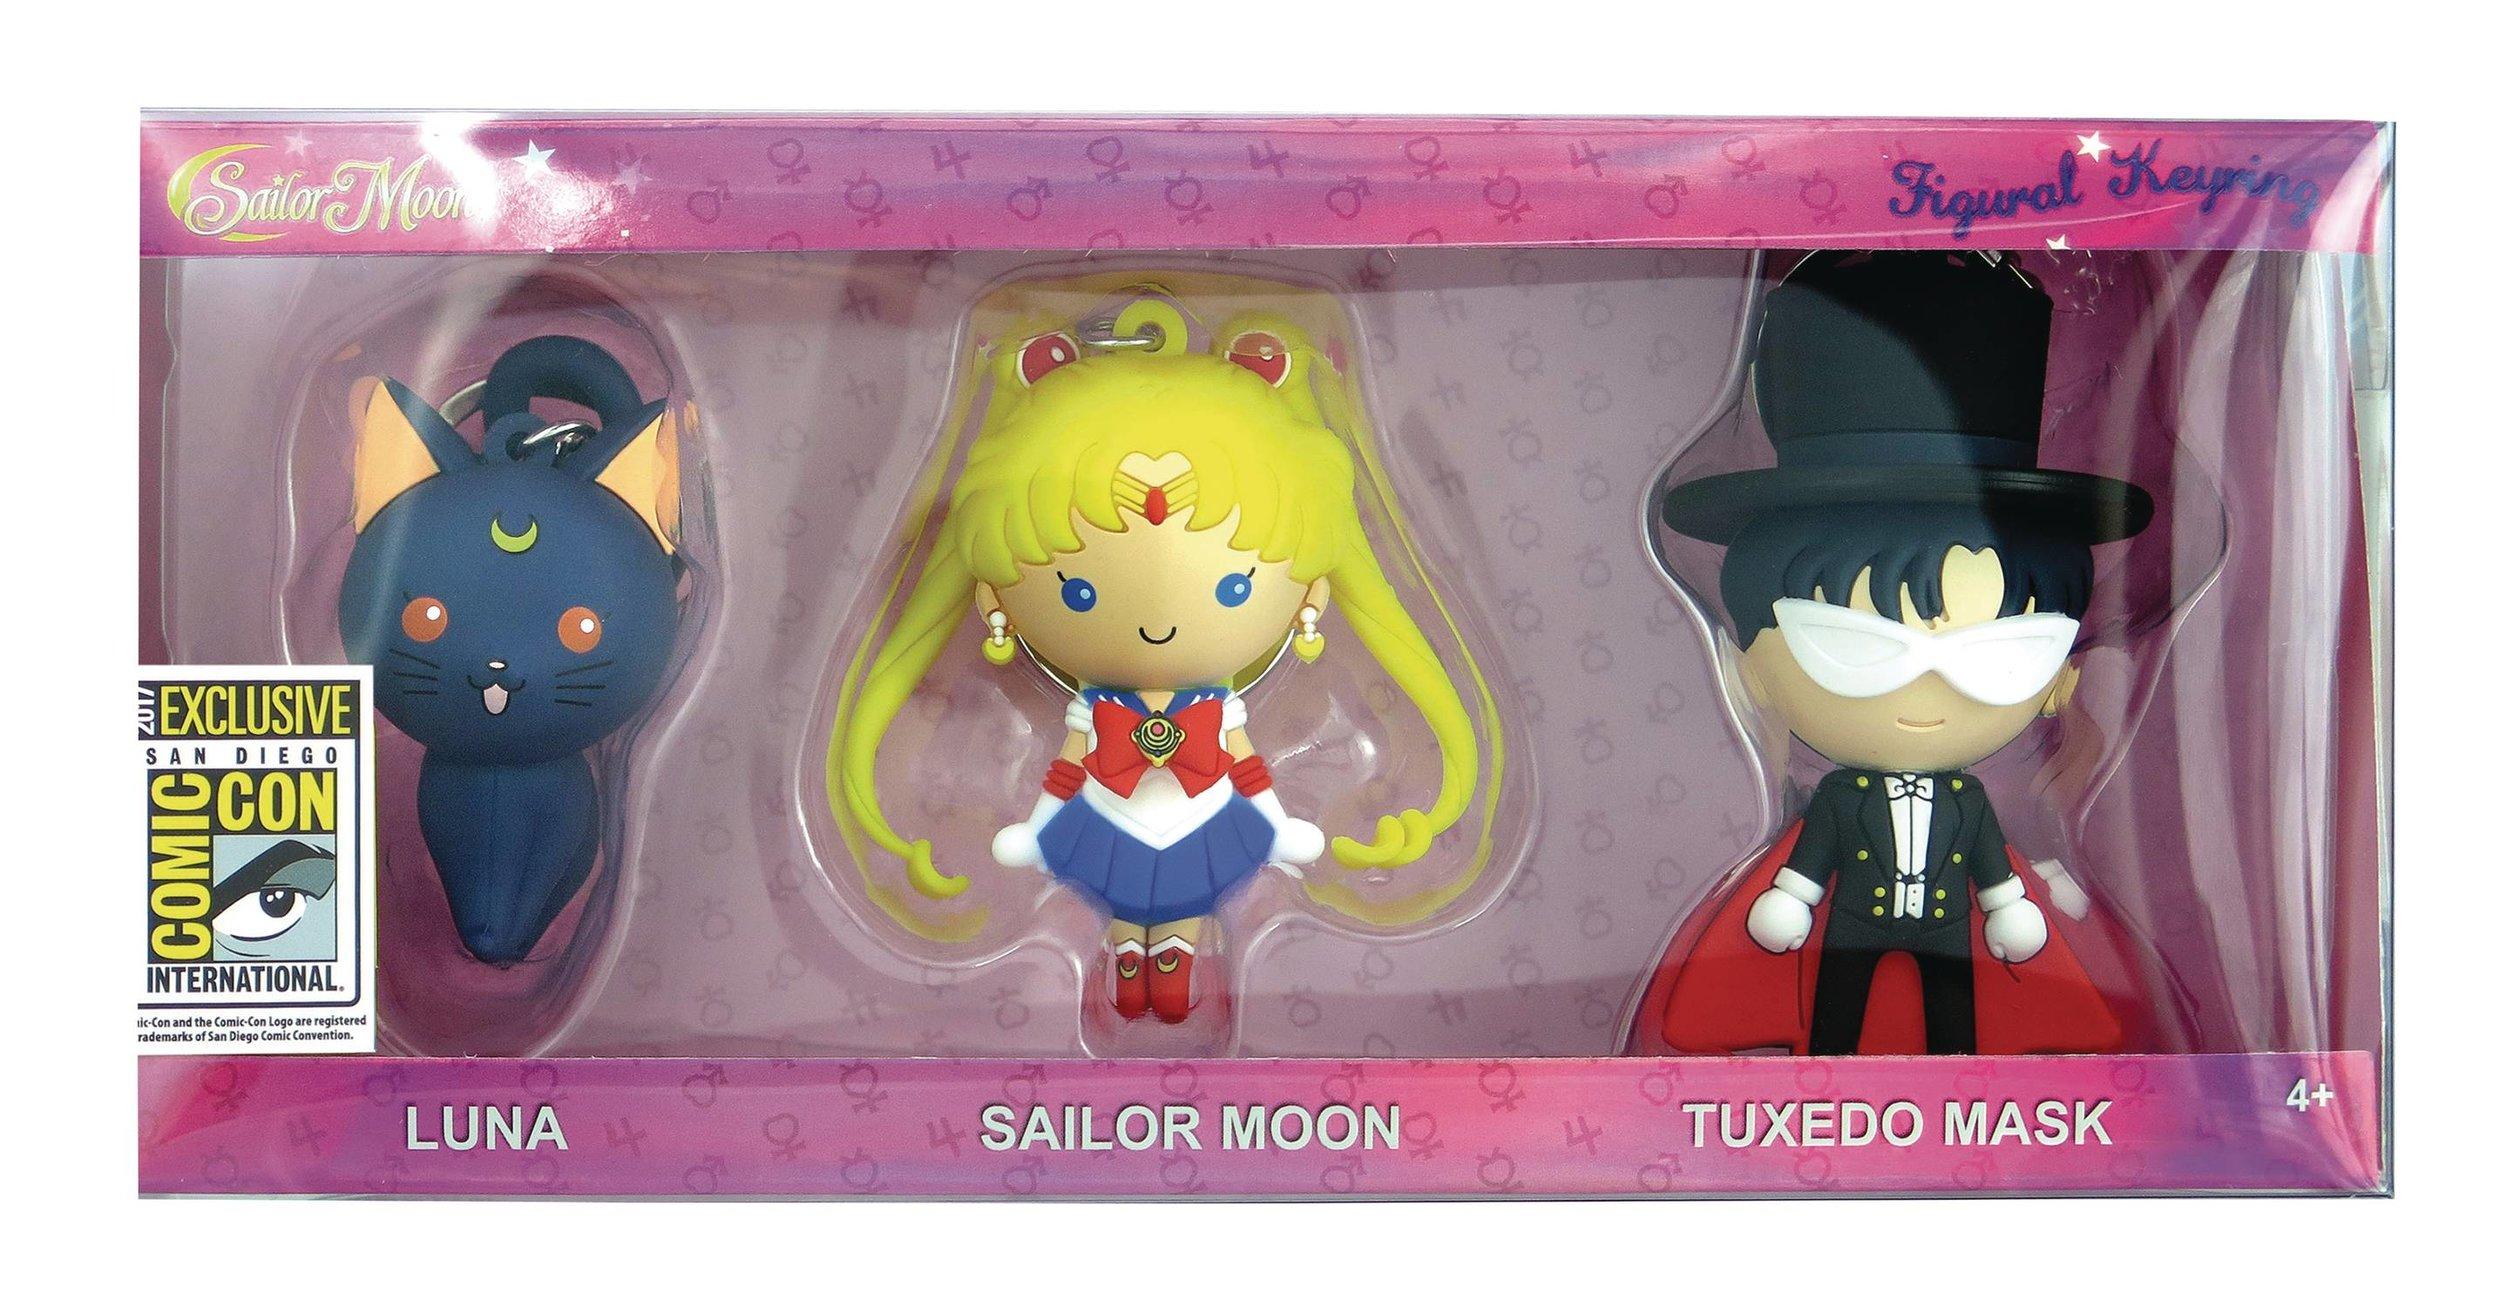 Monogram SDCC 2017 Sailor Moon Keychain set